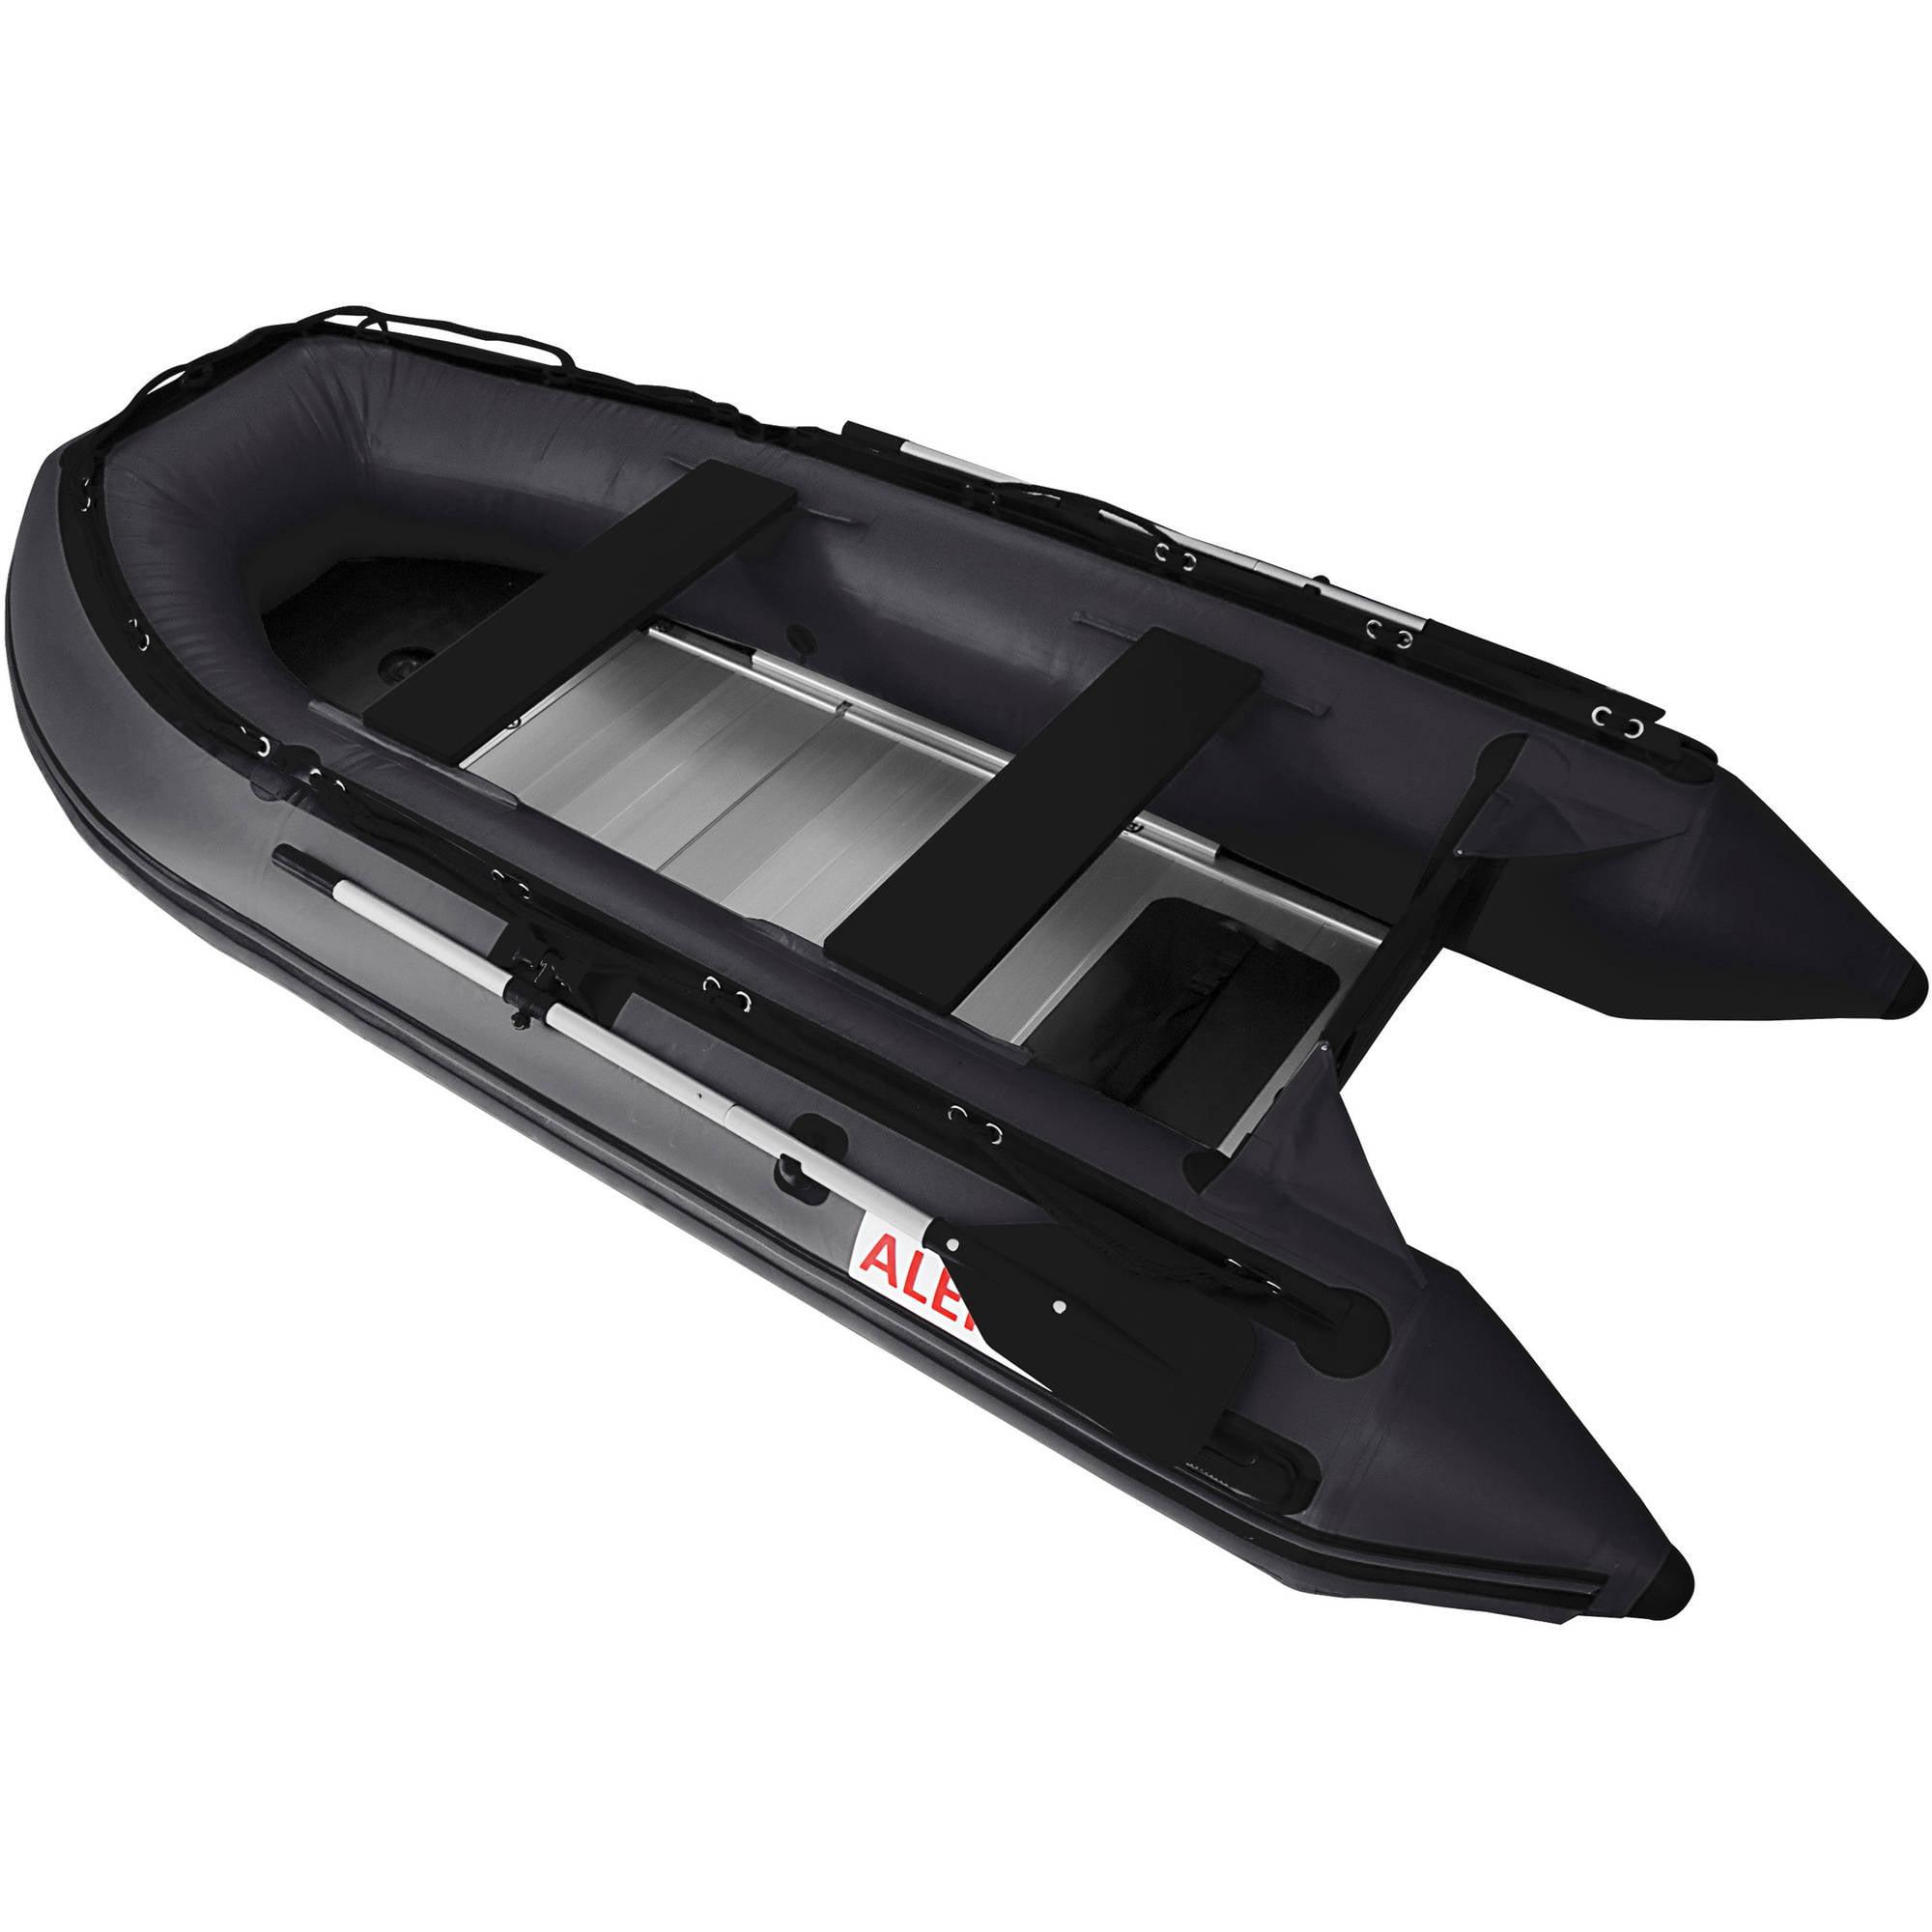 ALEKO Inflatable Boat - Aluminum Floor - 10.5 Feet - Black